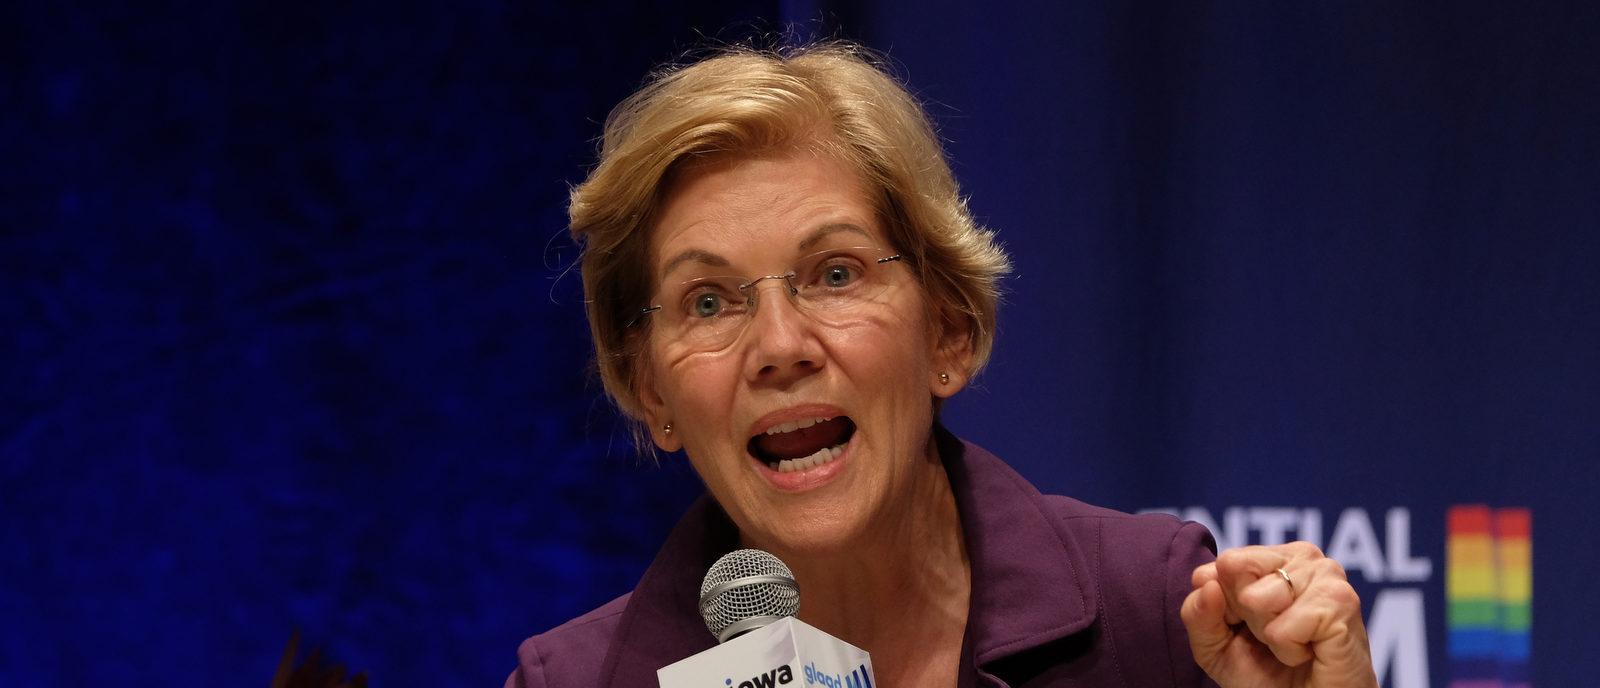 'Debts Must Be Repaid,' Elizabeth Warren Said Before Proposing Elimination Of Student Debt, Free College